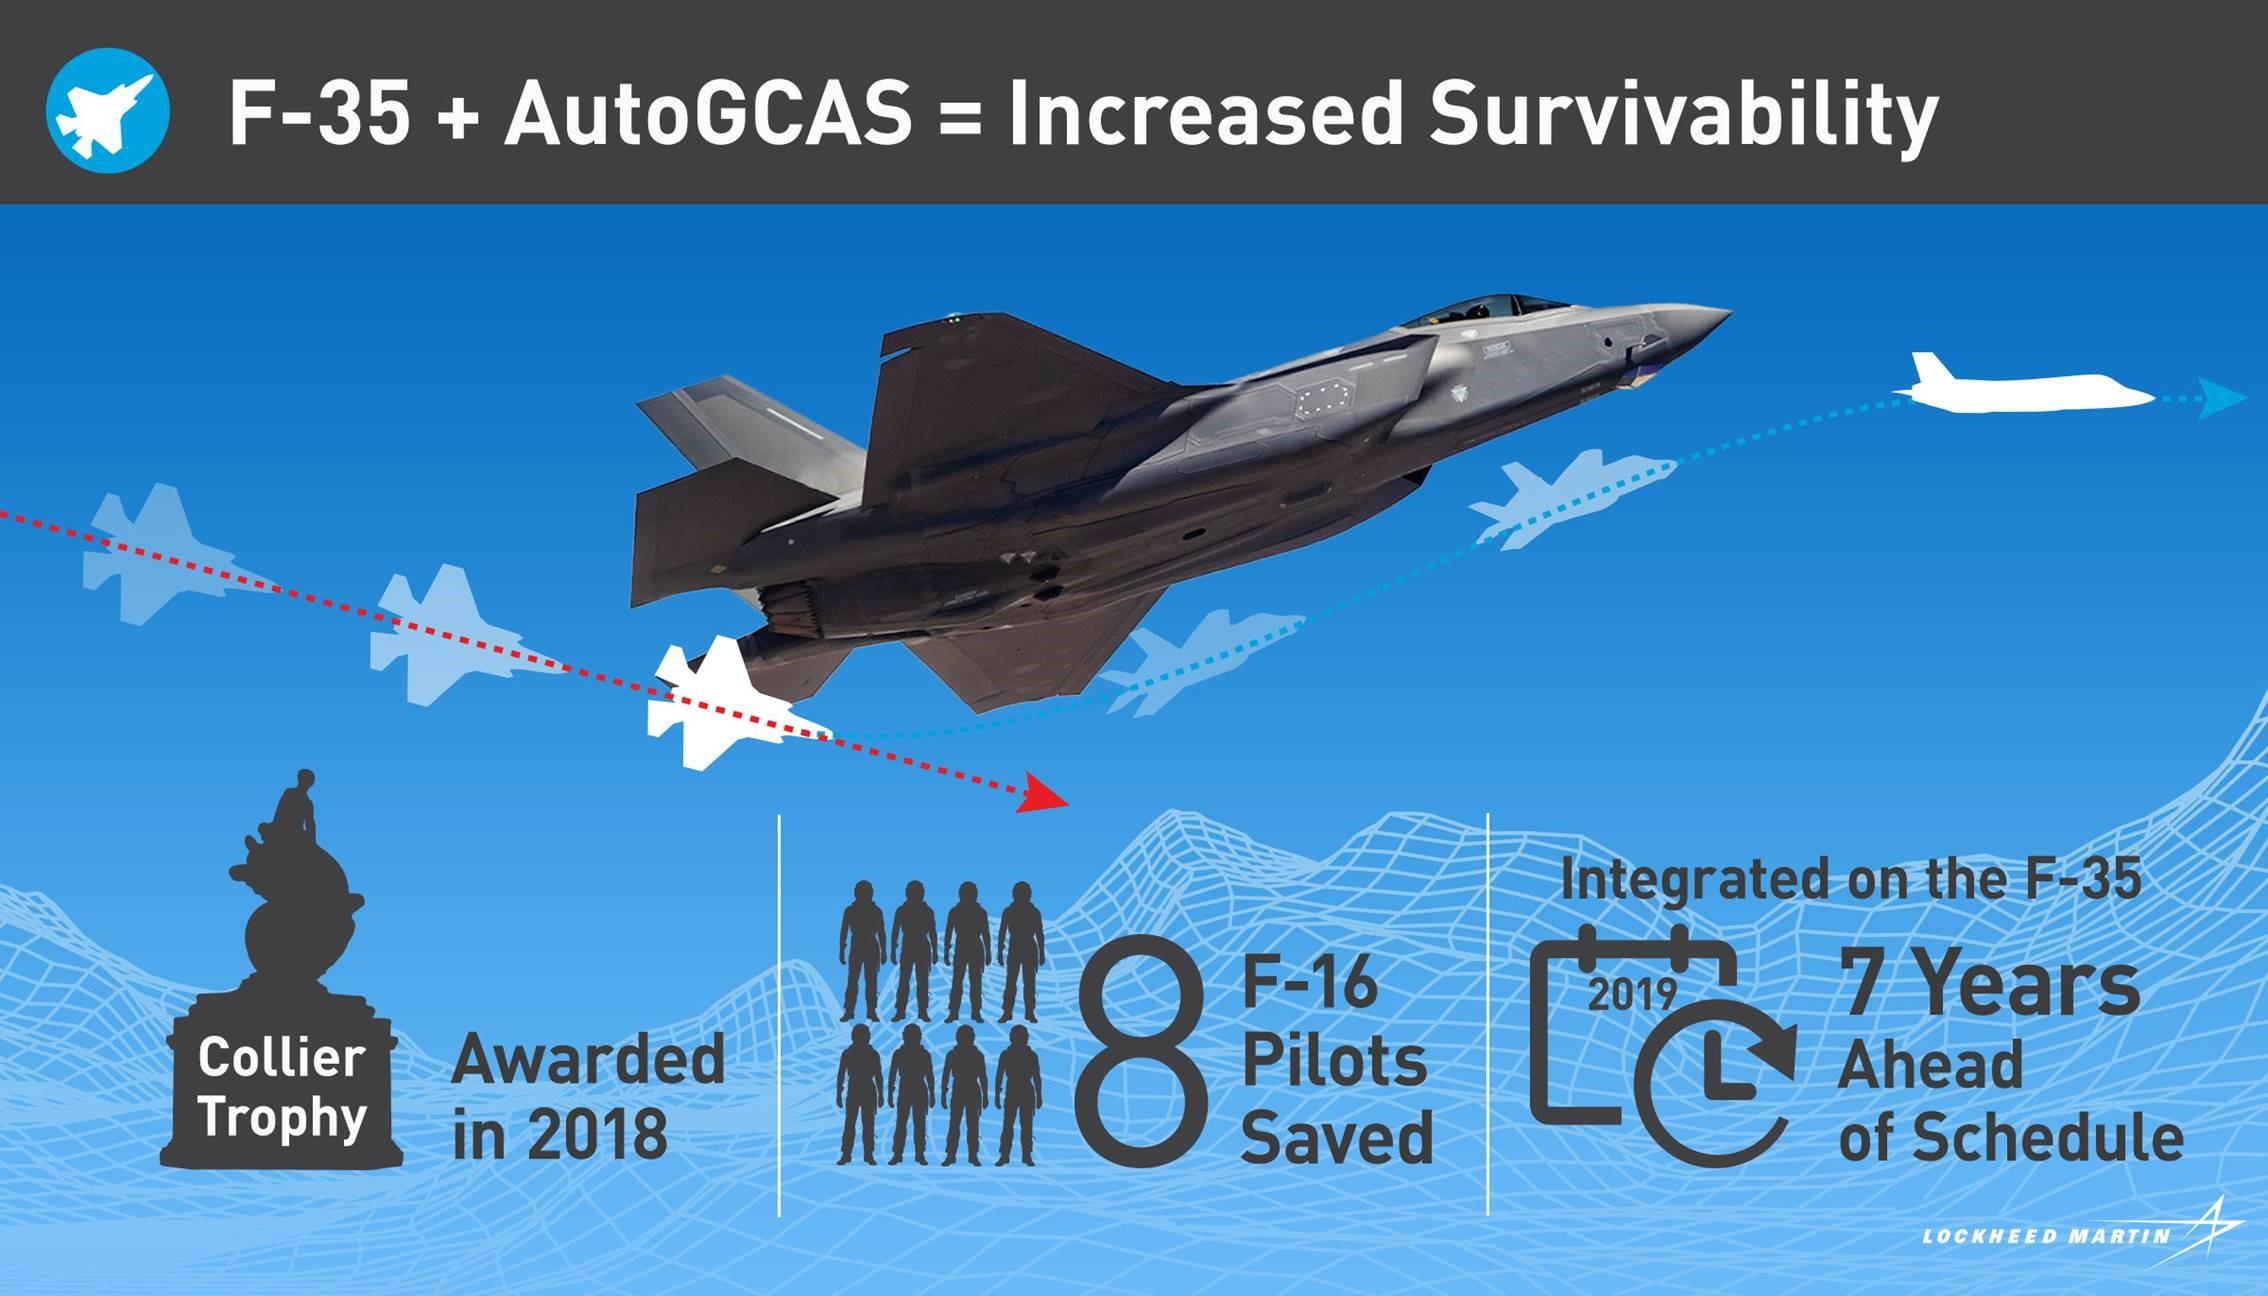 F-35 + AutoGCAS